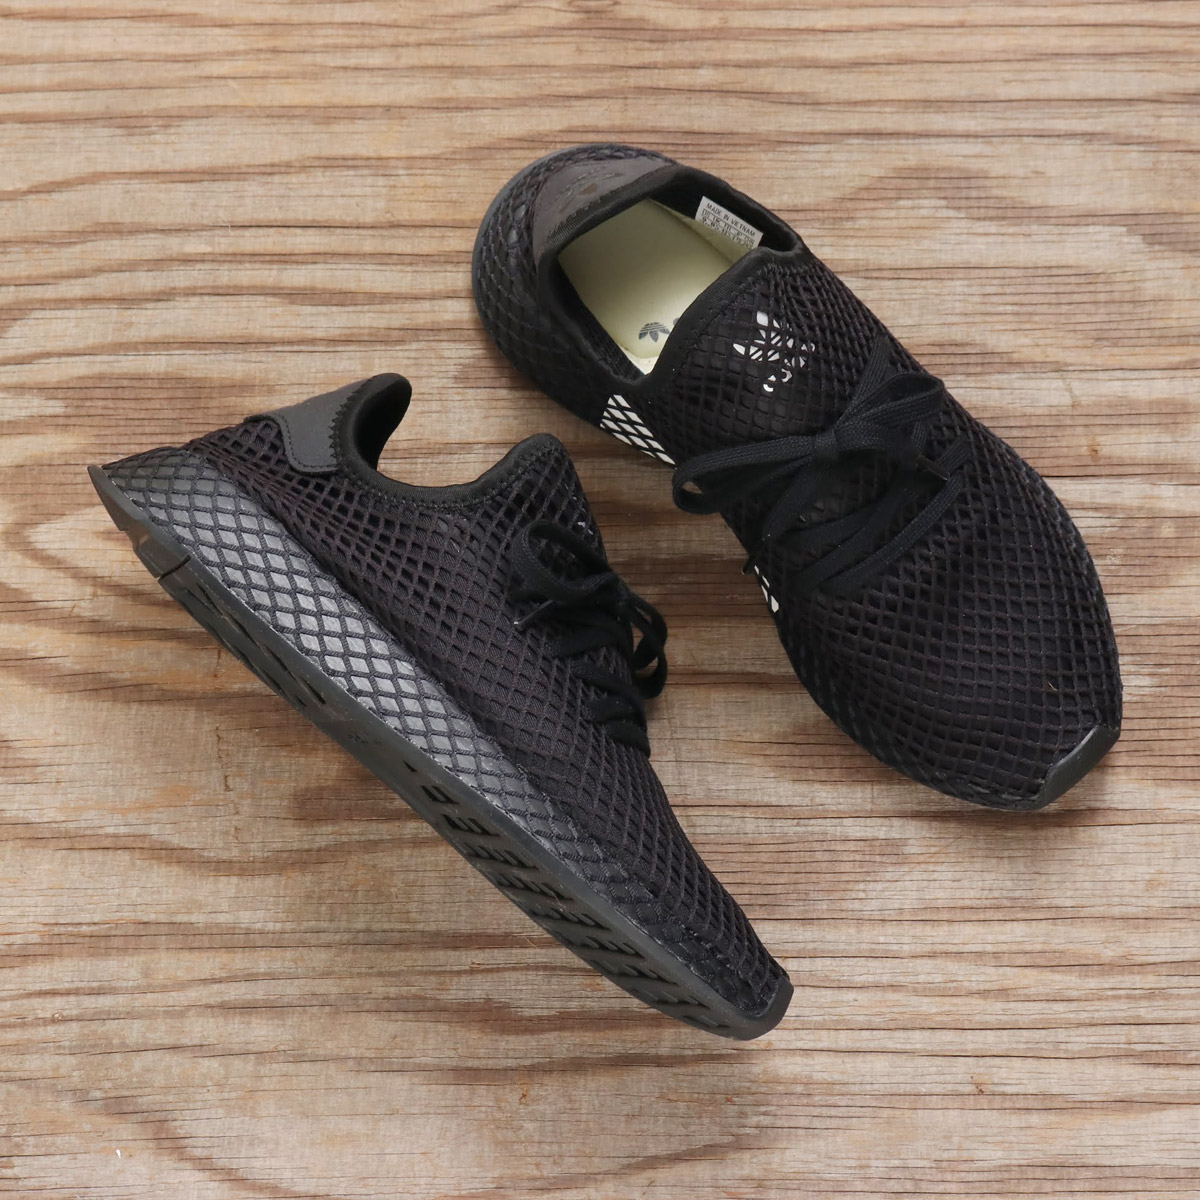 4e975b1e87f30 adidas Originals DEERUPT RUNNER (アディダスオリジナルスディラプトランナー) CORE BLACK CORE BLACK  RUNNING WHITE 18FA-I